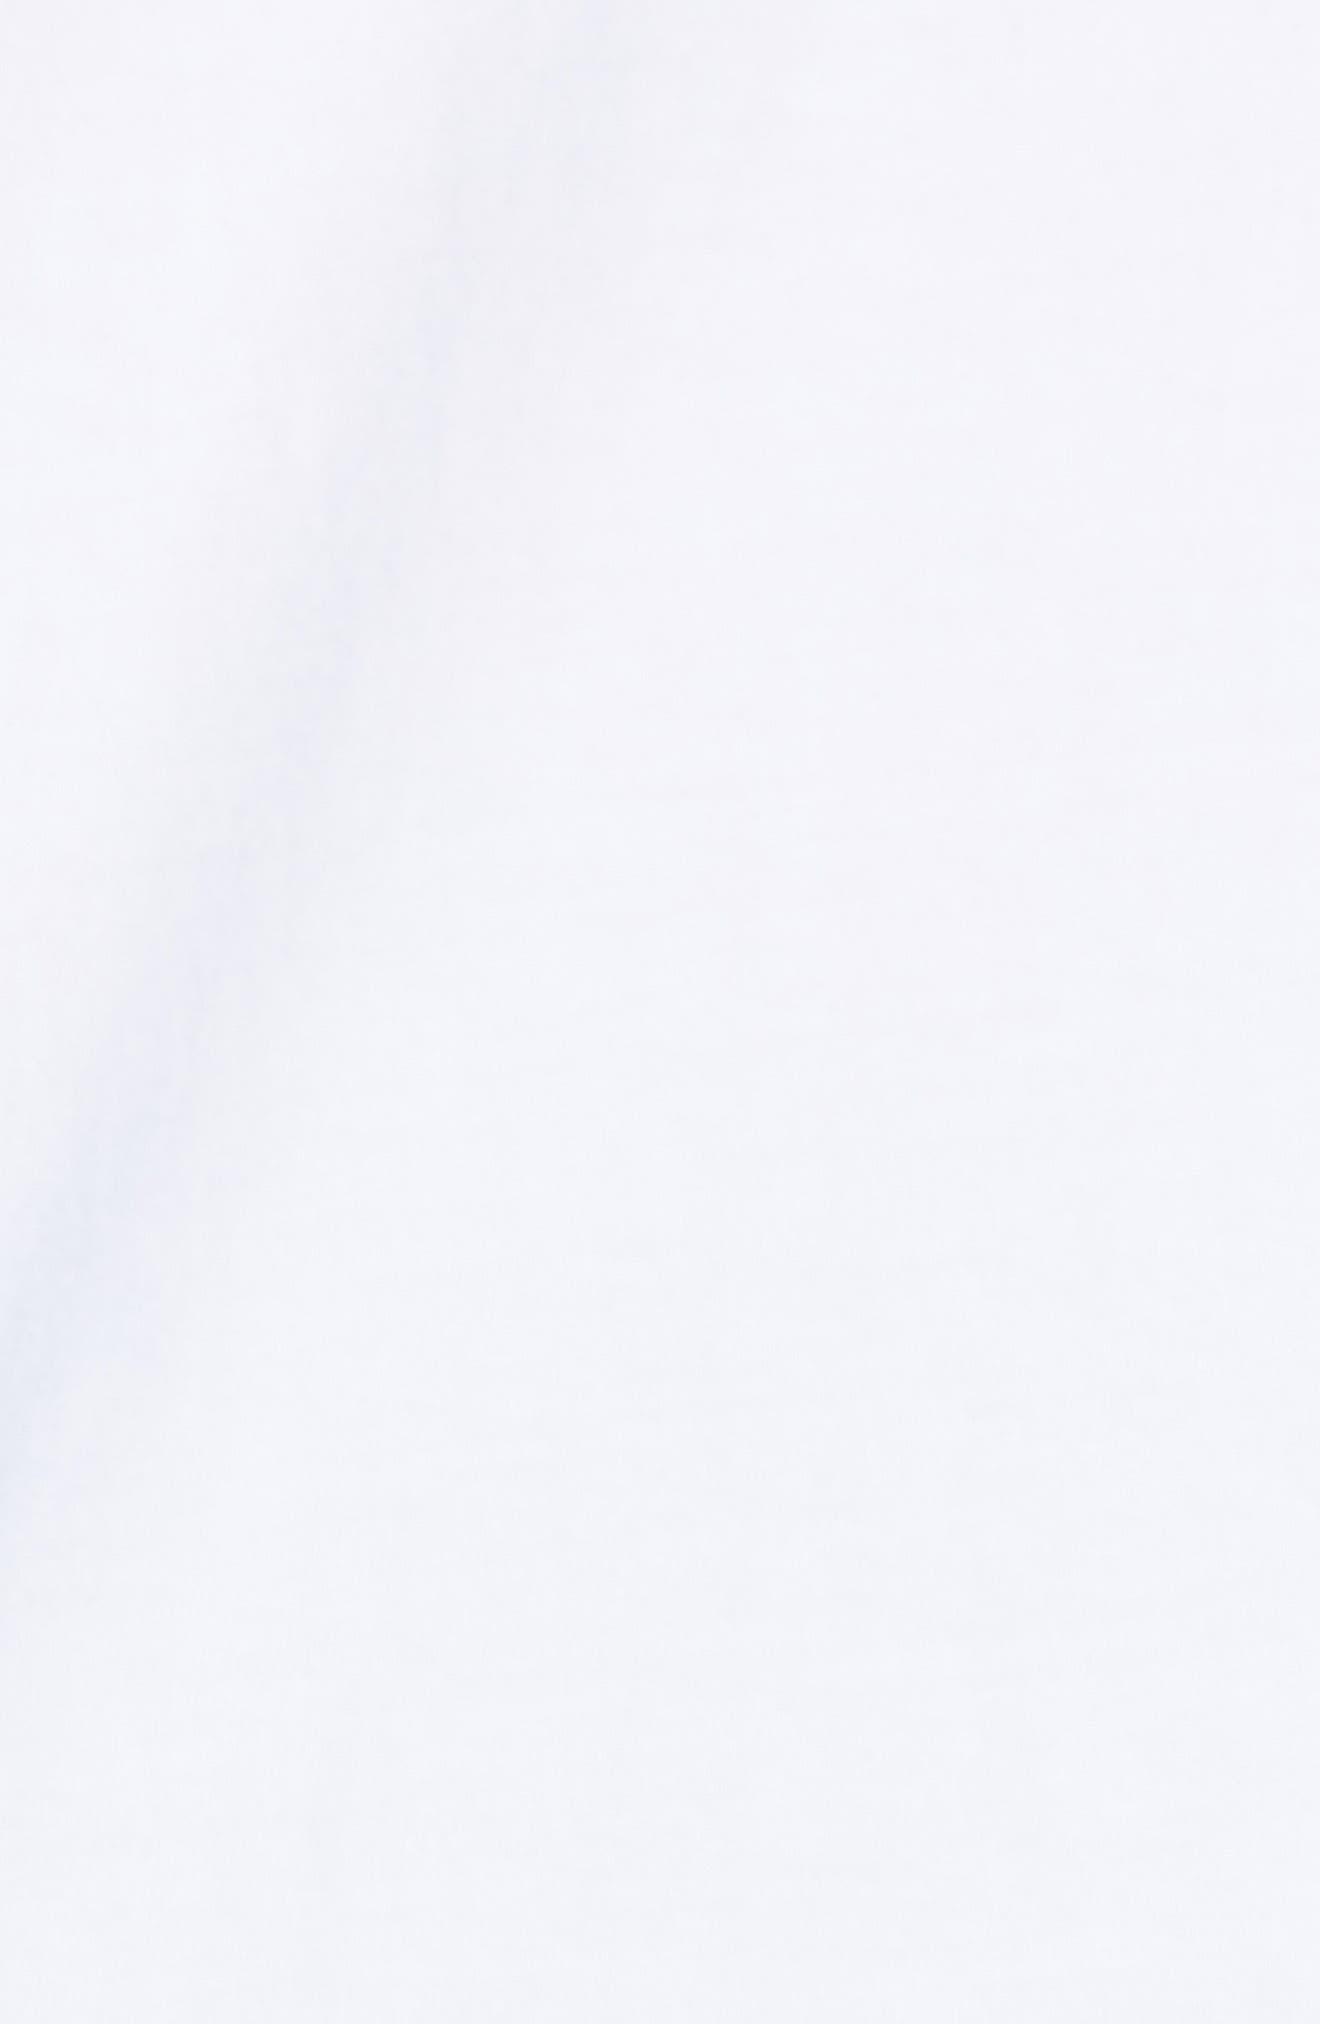 VINEYARD VINES,                             Valentine's Day Pocket T-Shirt,                             Alternate thumbnail 5, color,                             WHITE CAP